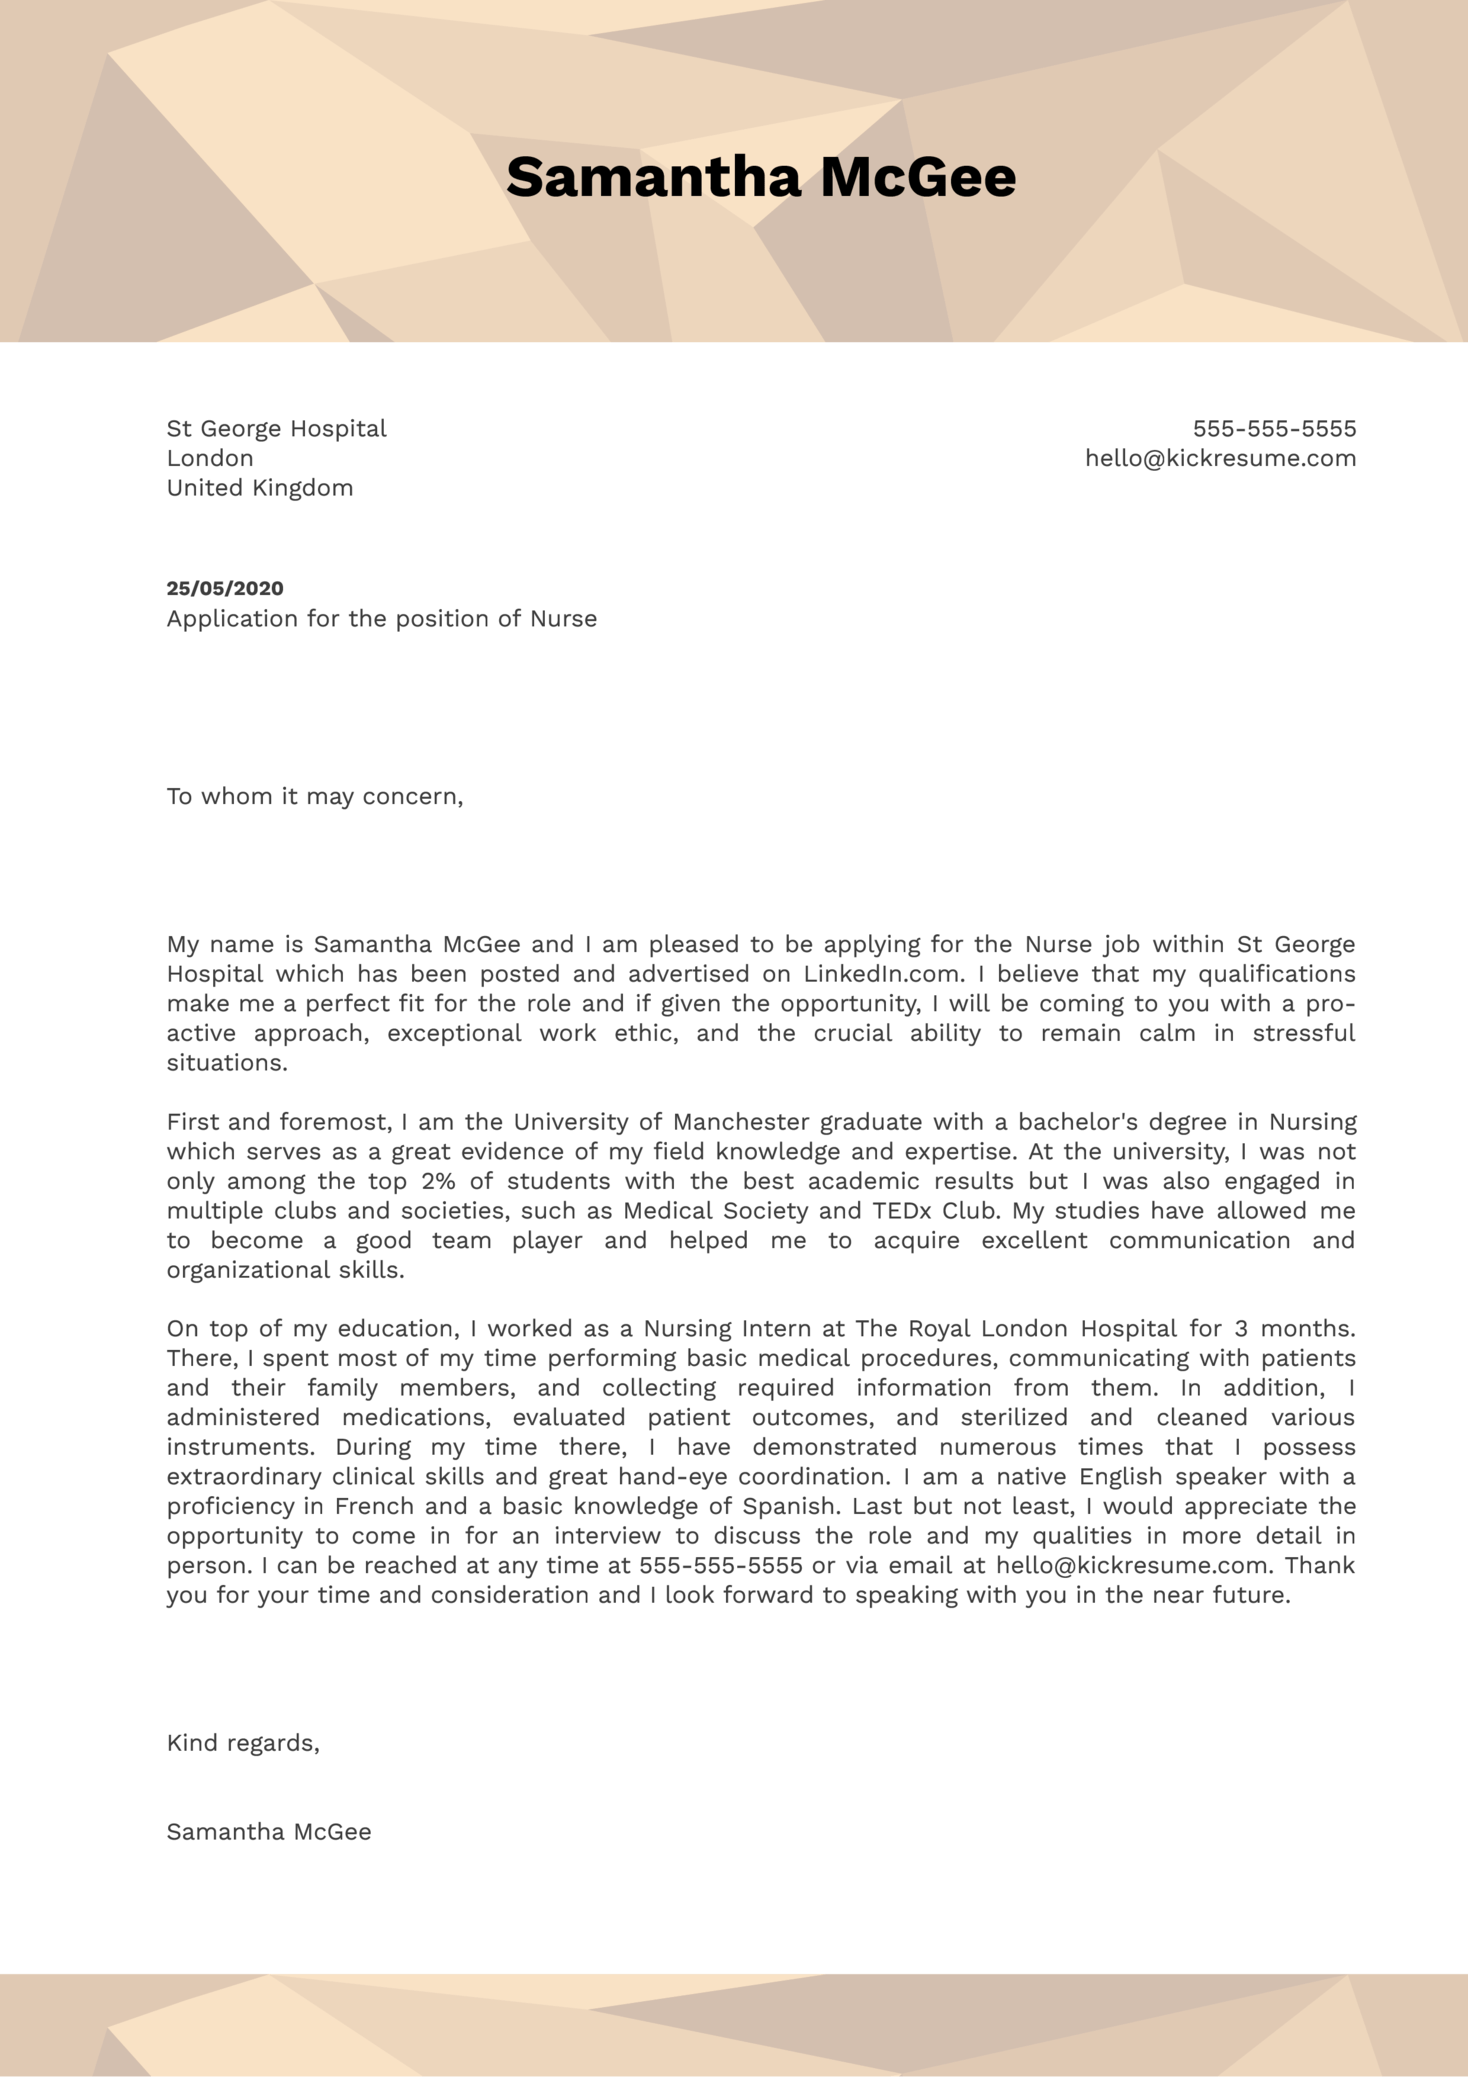 New Grad Nurse Cover Letter Sample